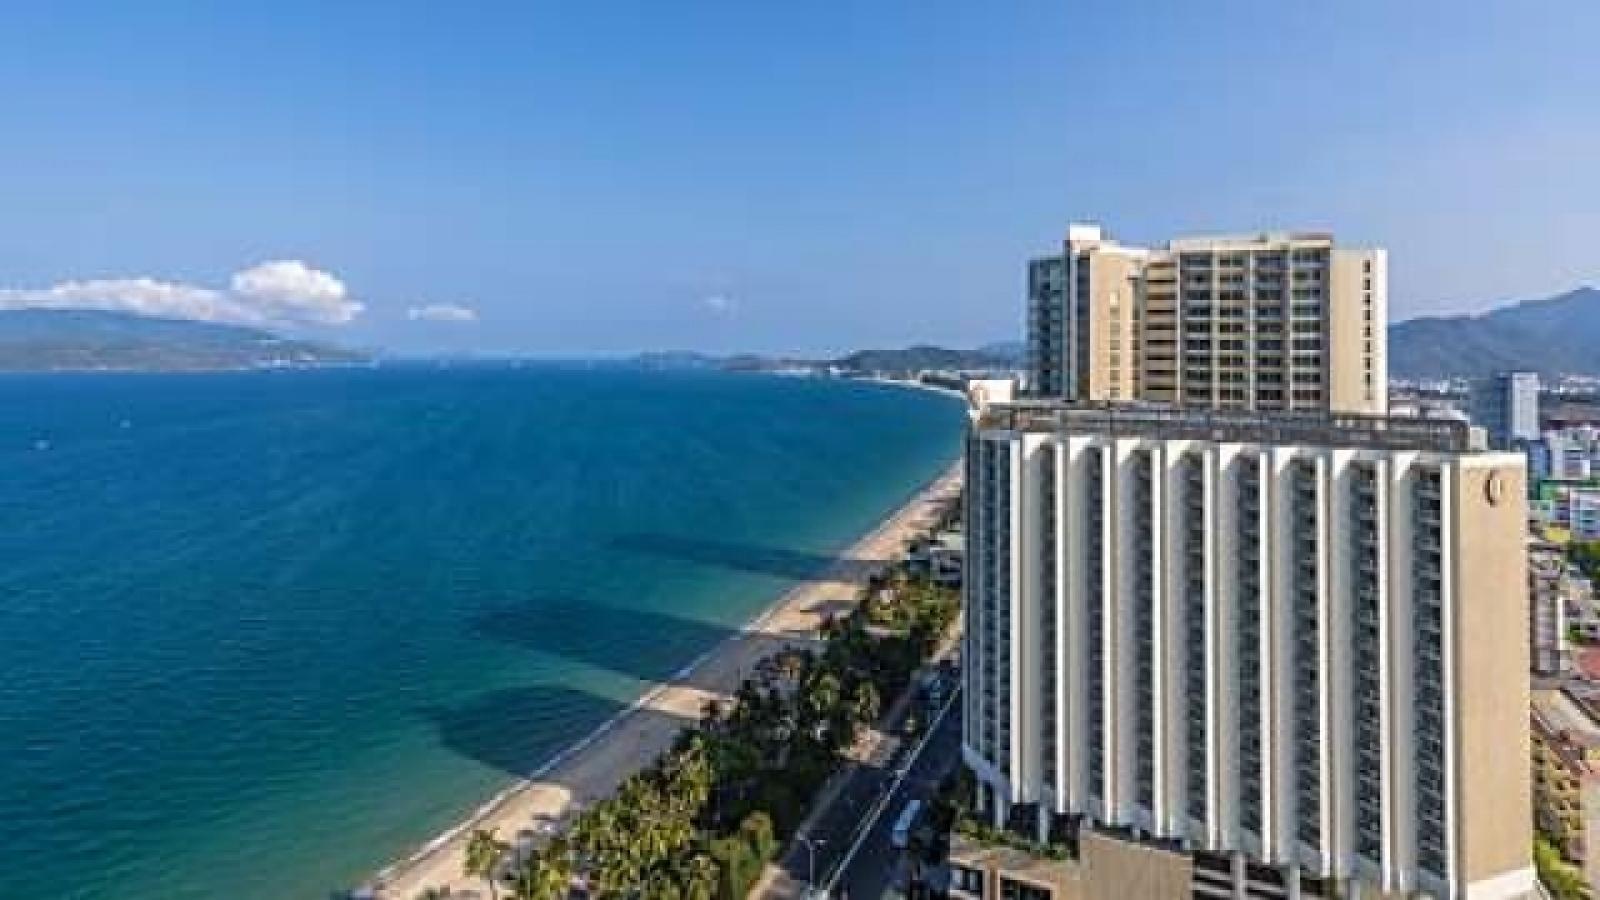 Vietnam cities garner heightened interest of hospitality investors